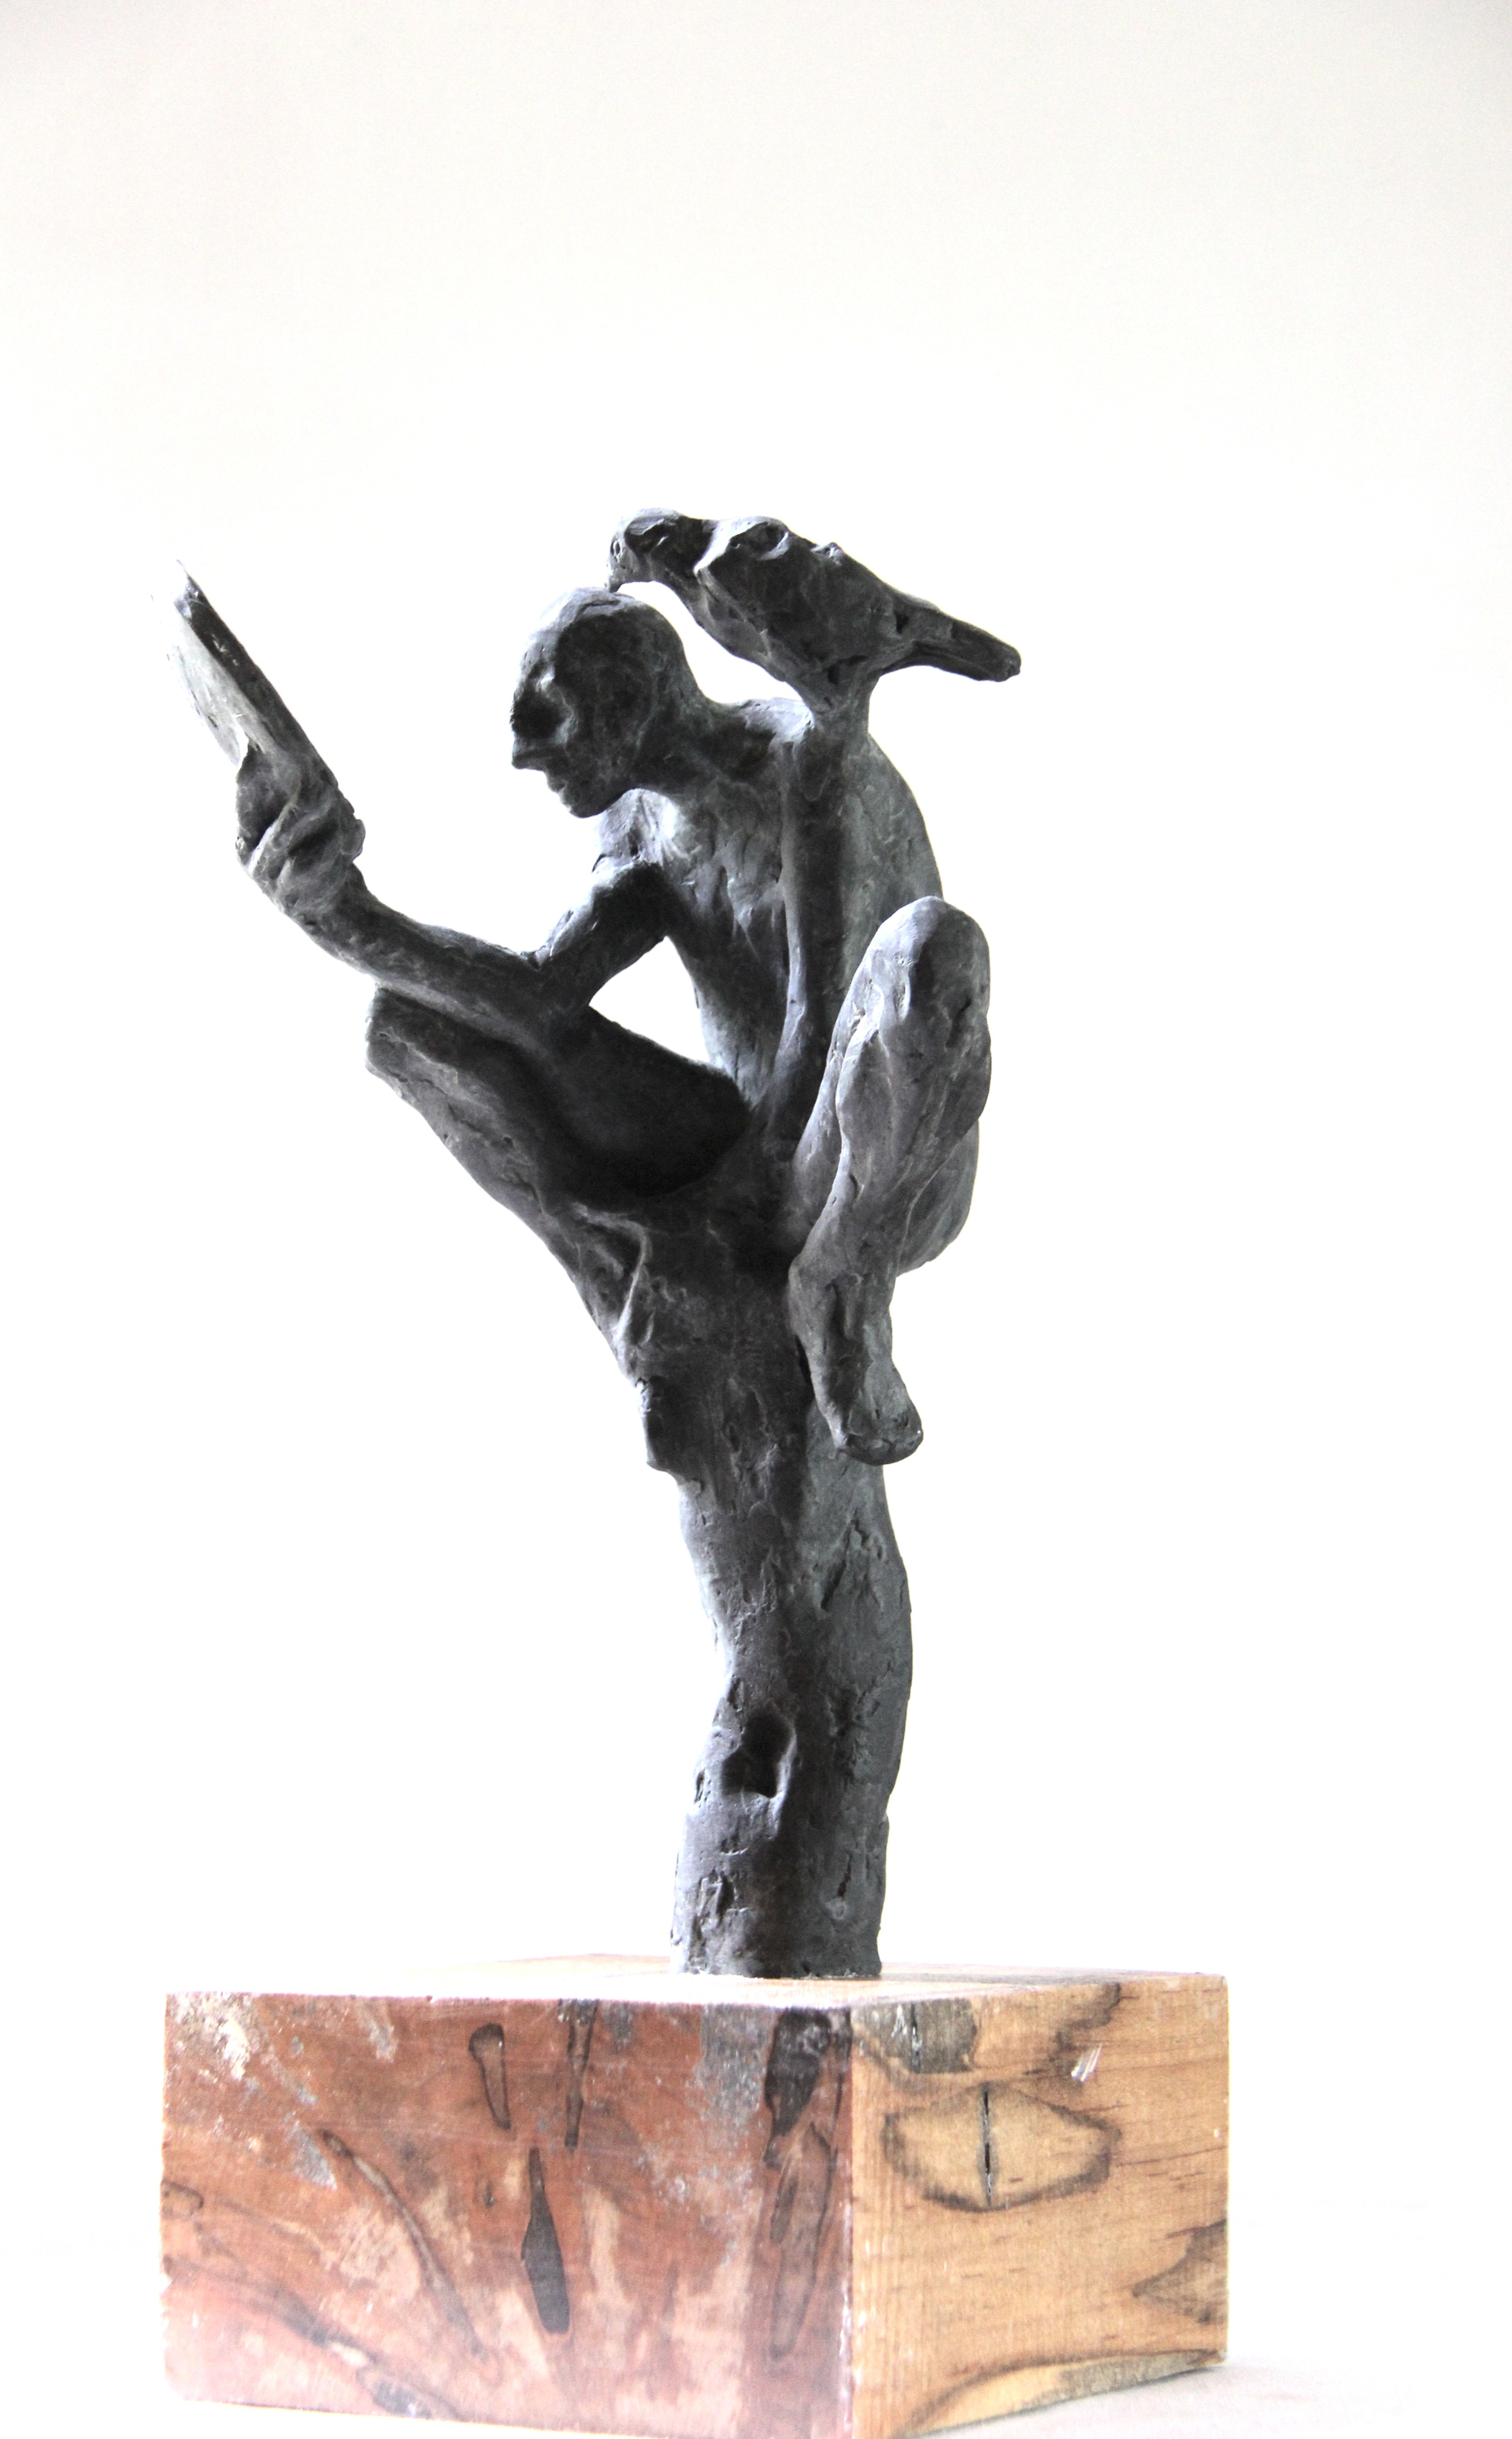 Man and the Bird by Belgin Yucelen